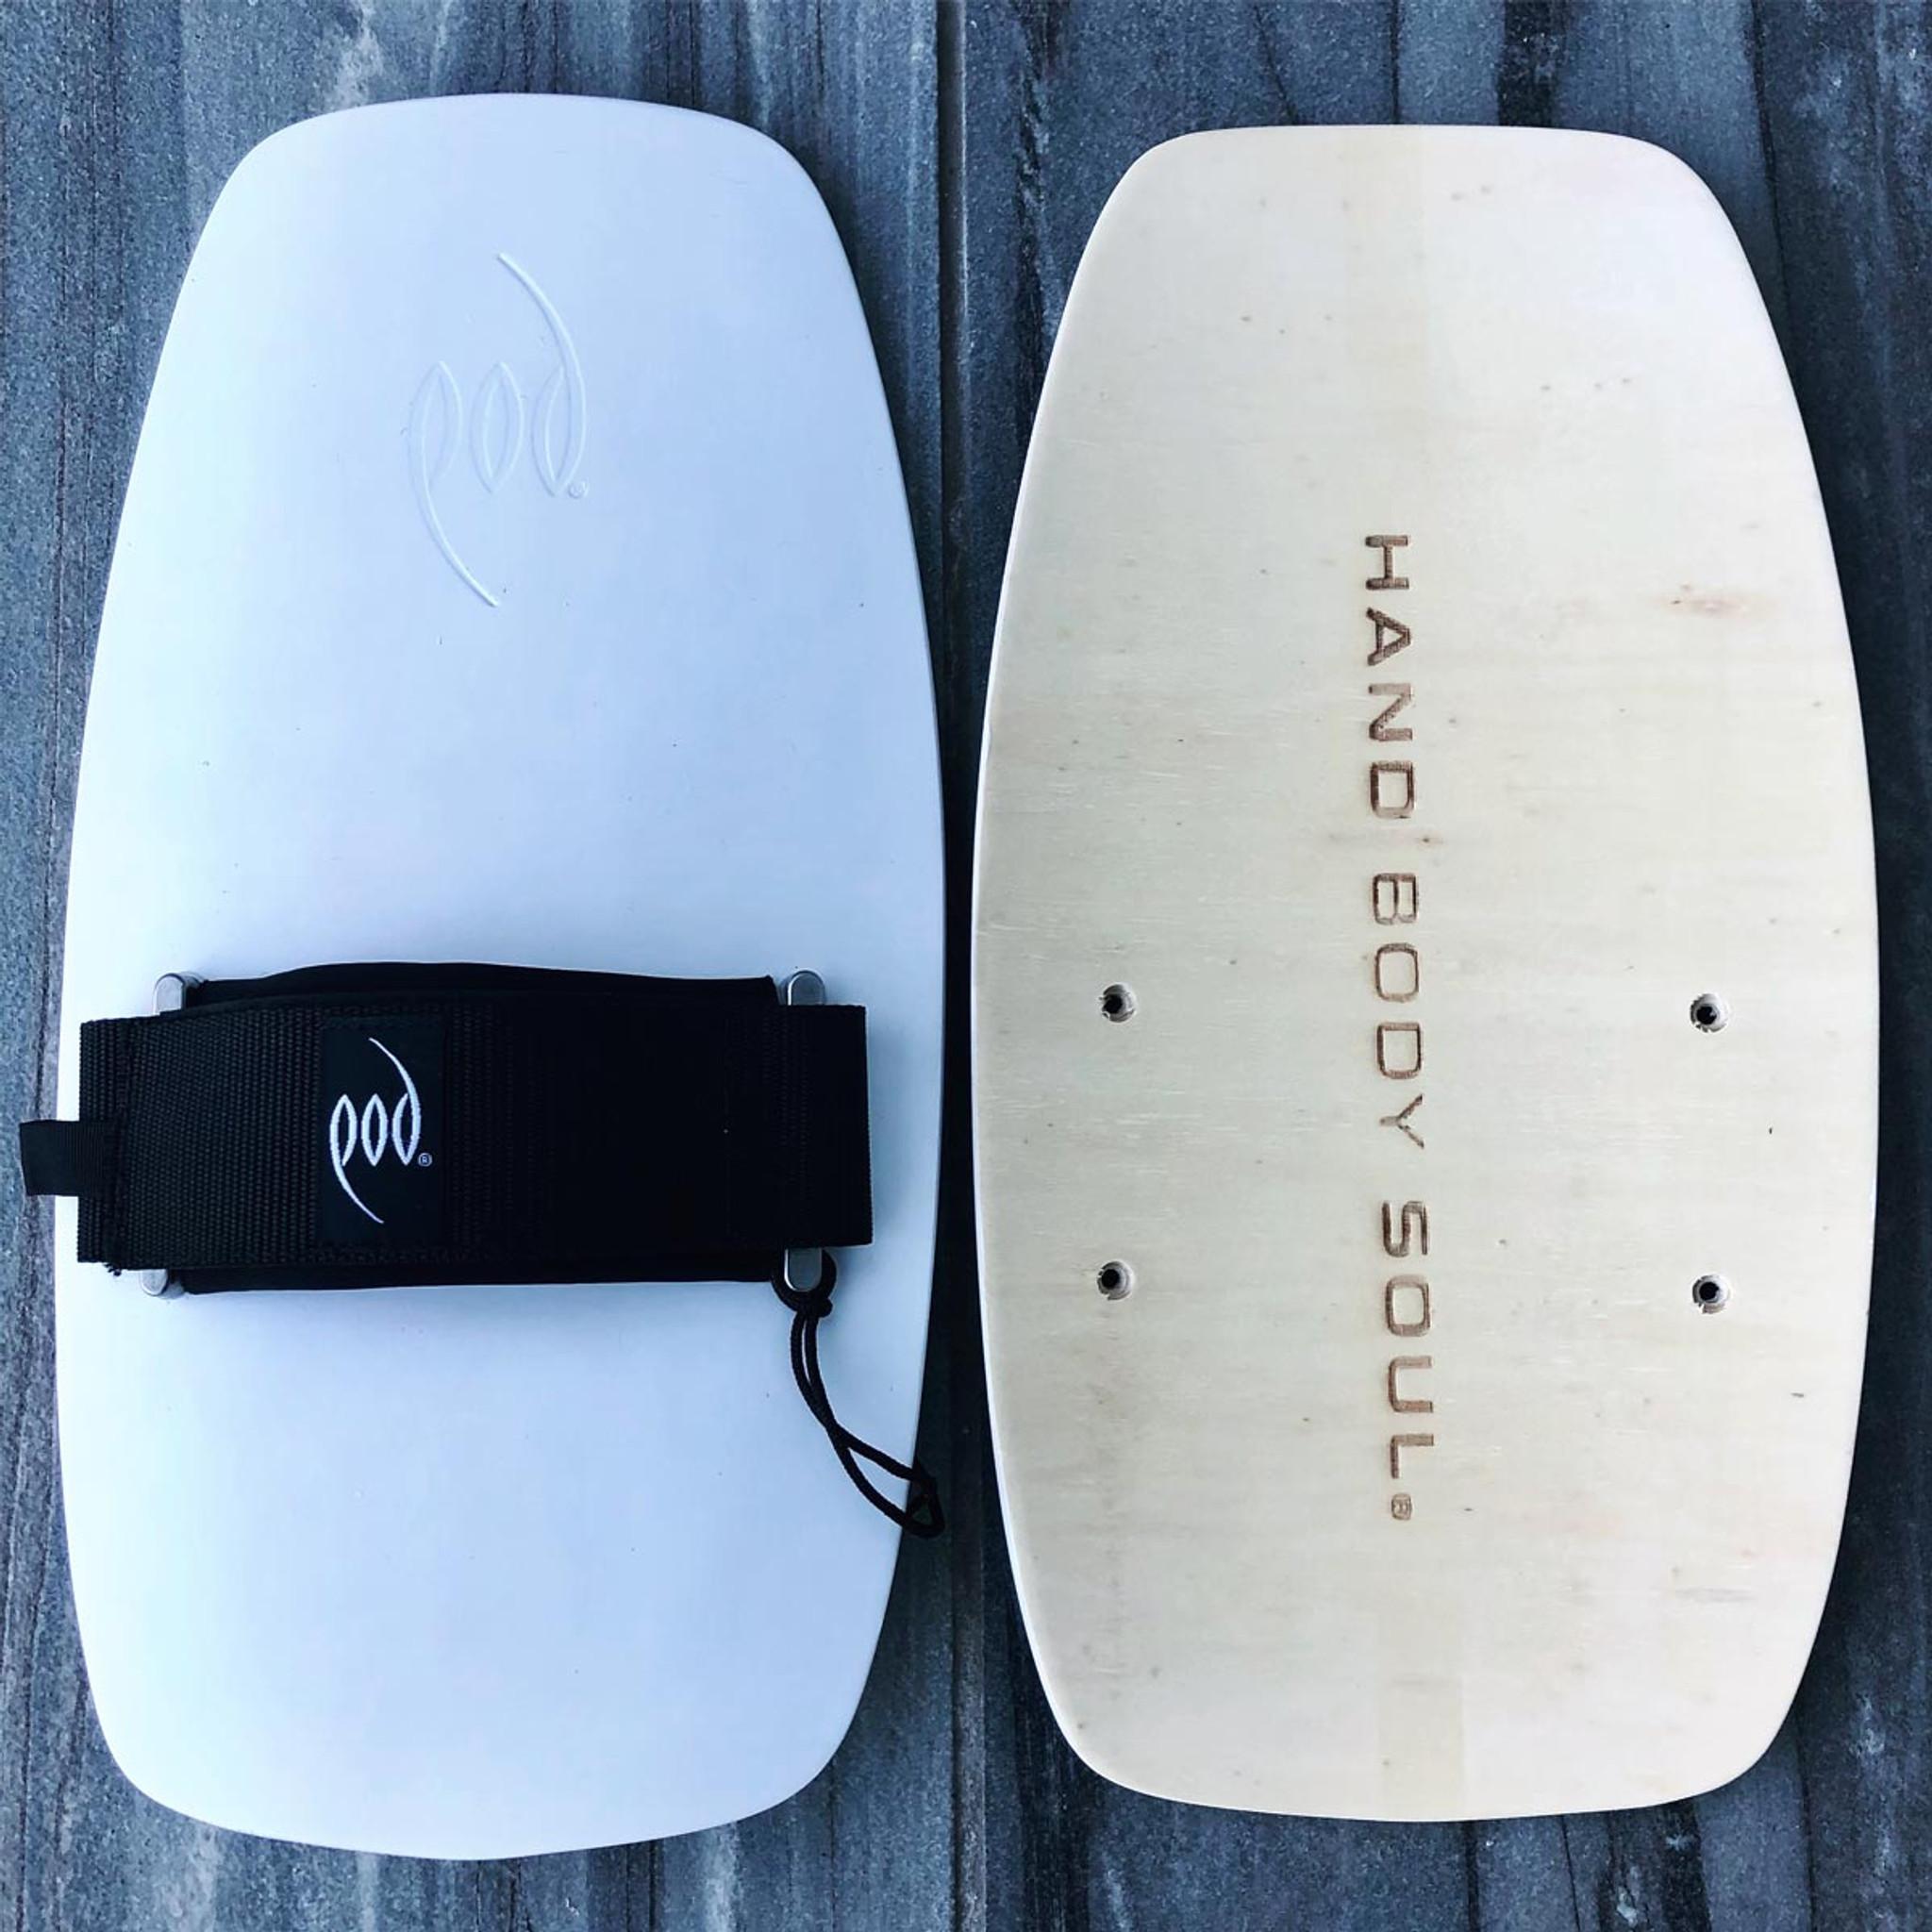 Bodysurfing Gear - Wood Handplane POD PF1s Socks Savers